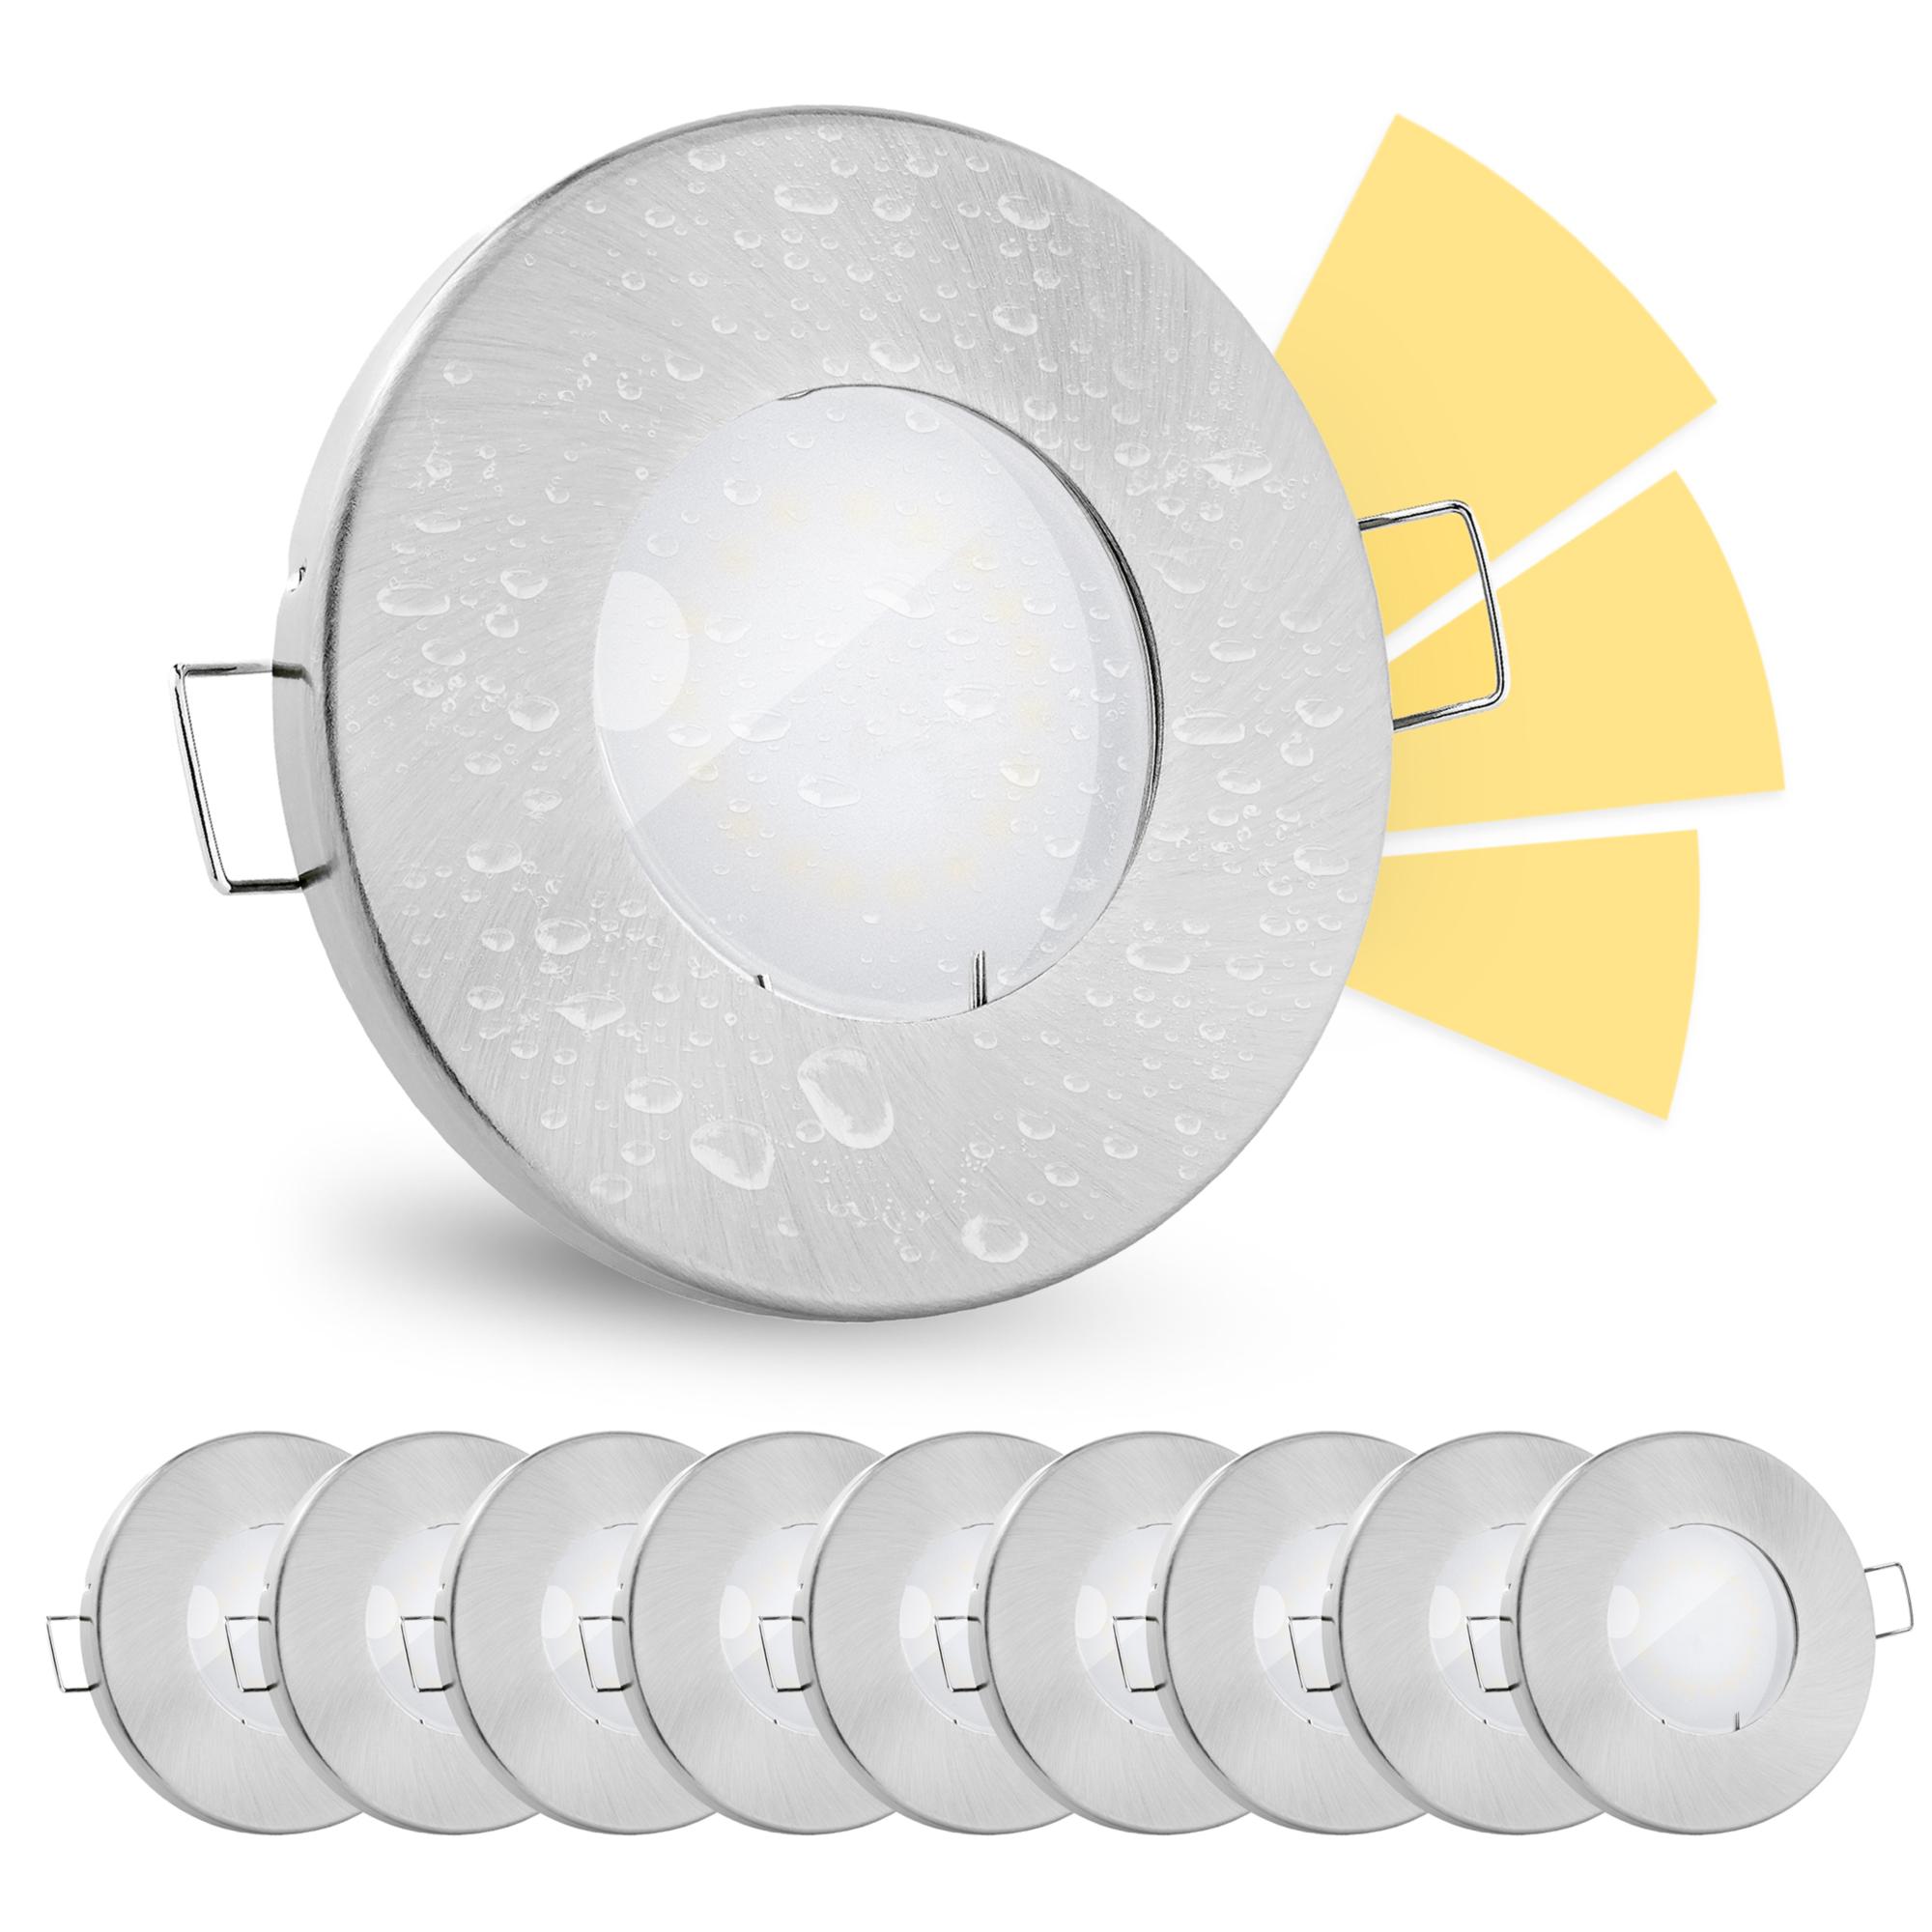 20 Stück fourSTEP LED Einbauspots Bad